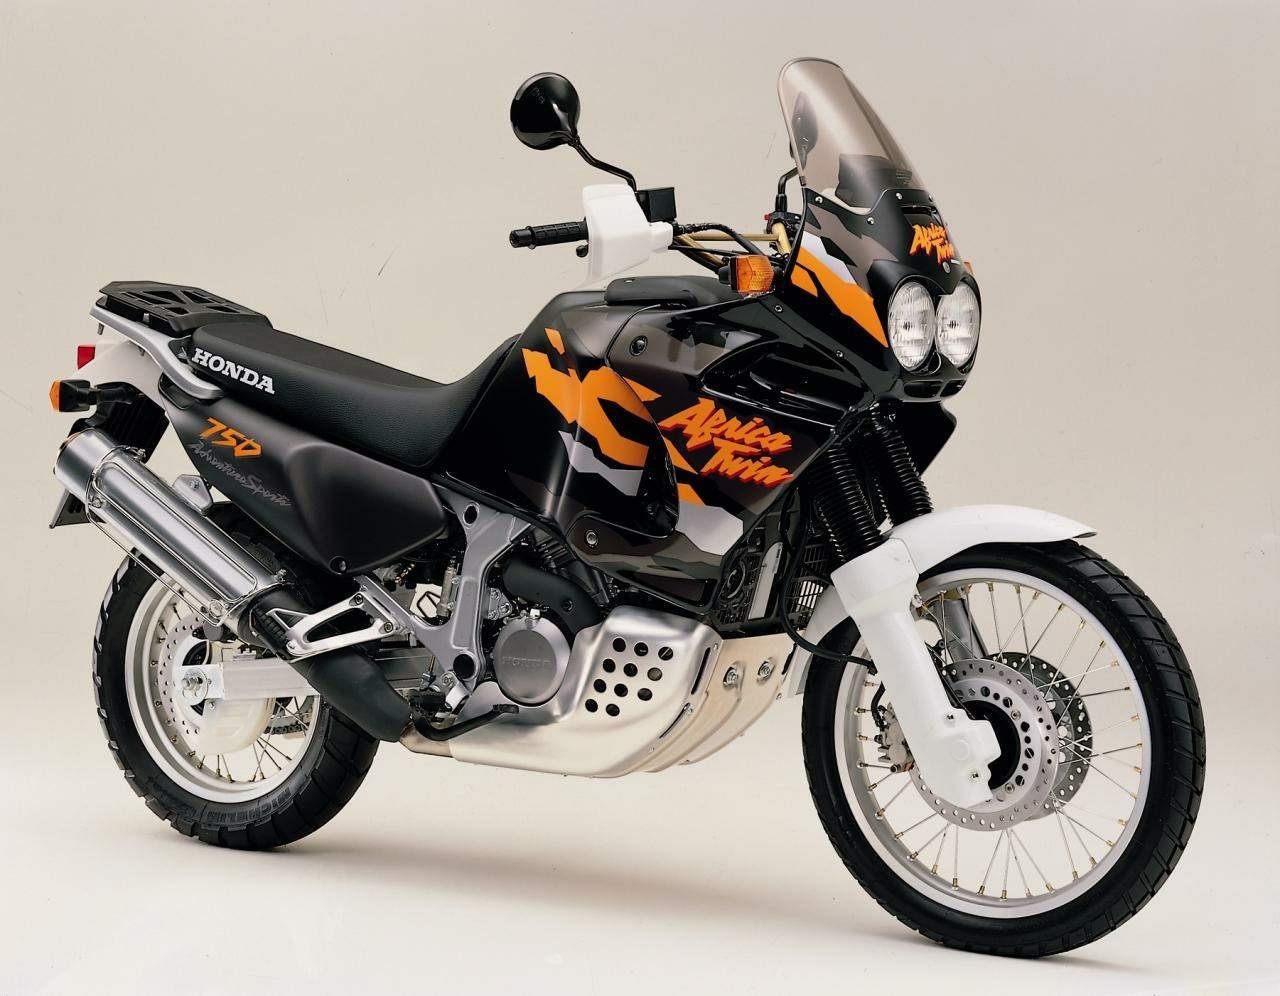 Buy motorbike Pre-owned HONDA XRV 750 Africa Twin Moto Lehmann AG Riedtwil ID: 7491851 Zeile: 121